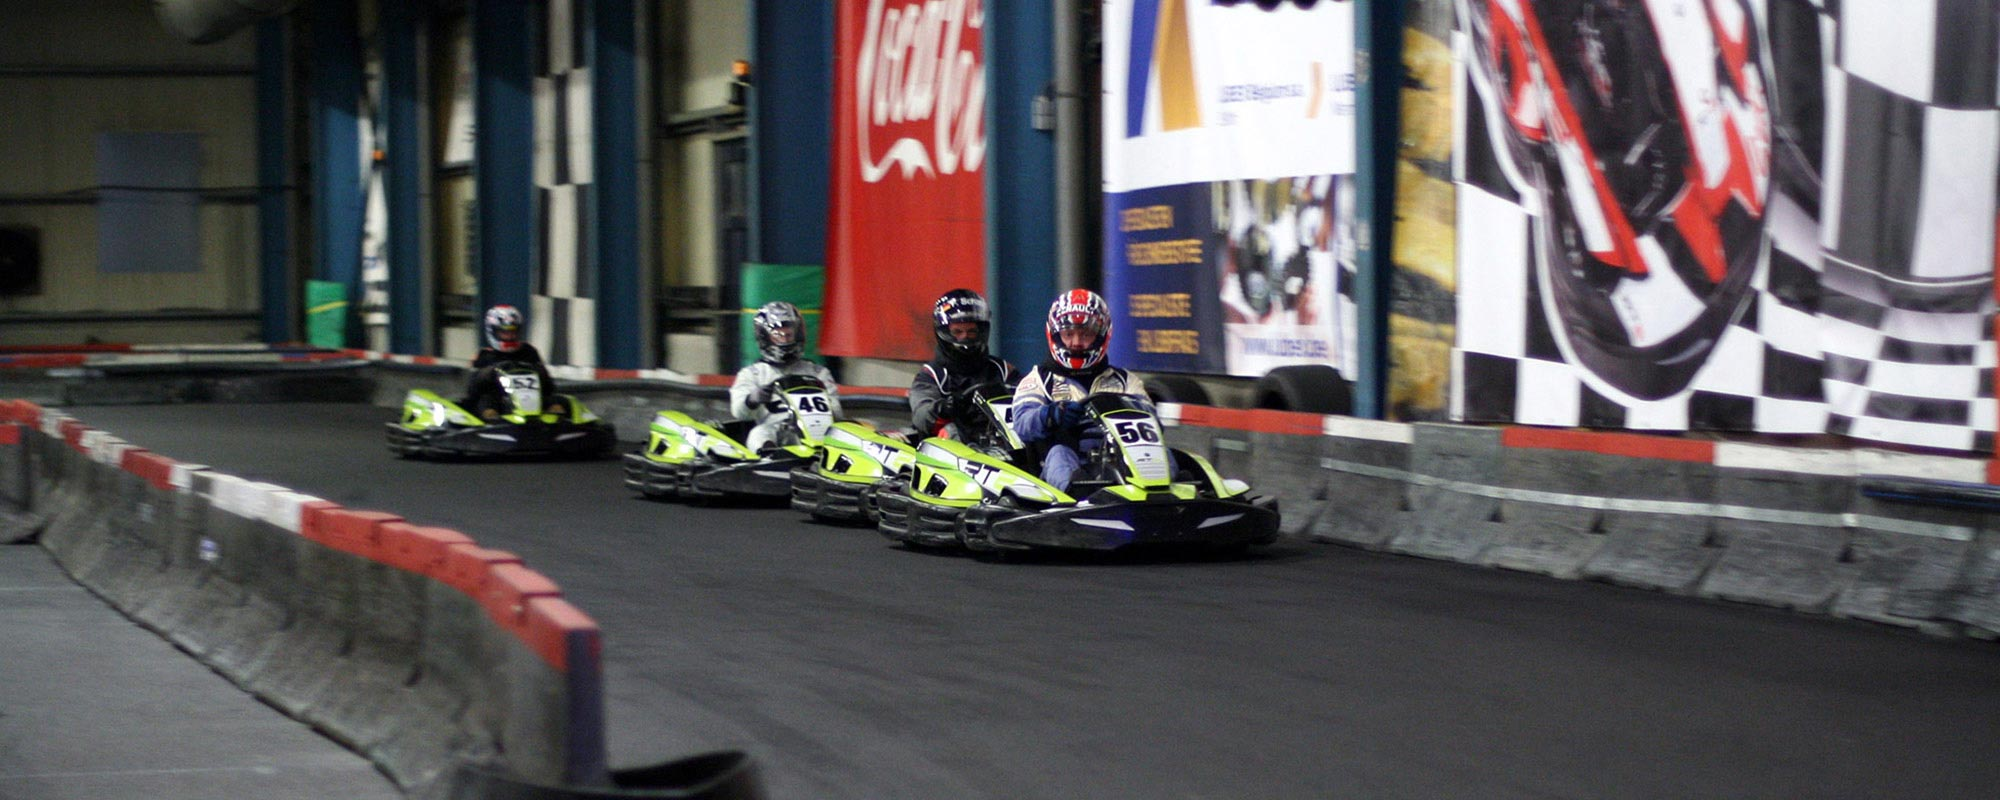 ebafkc-karting-2000x800-10